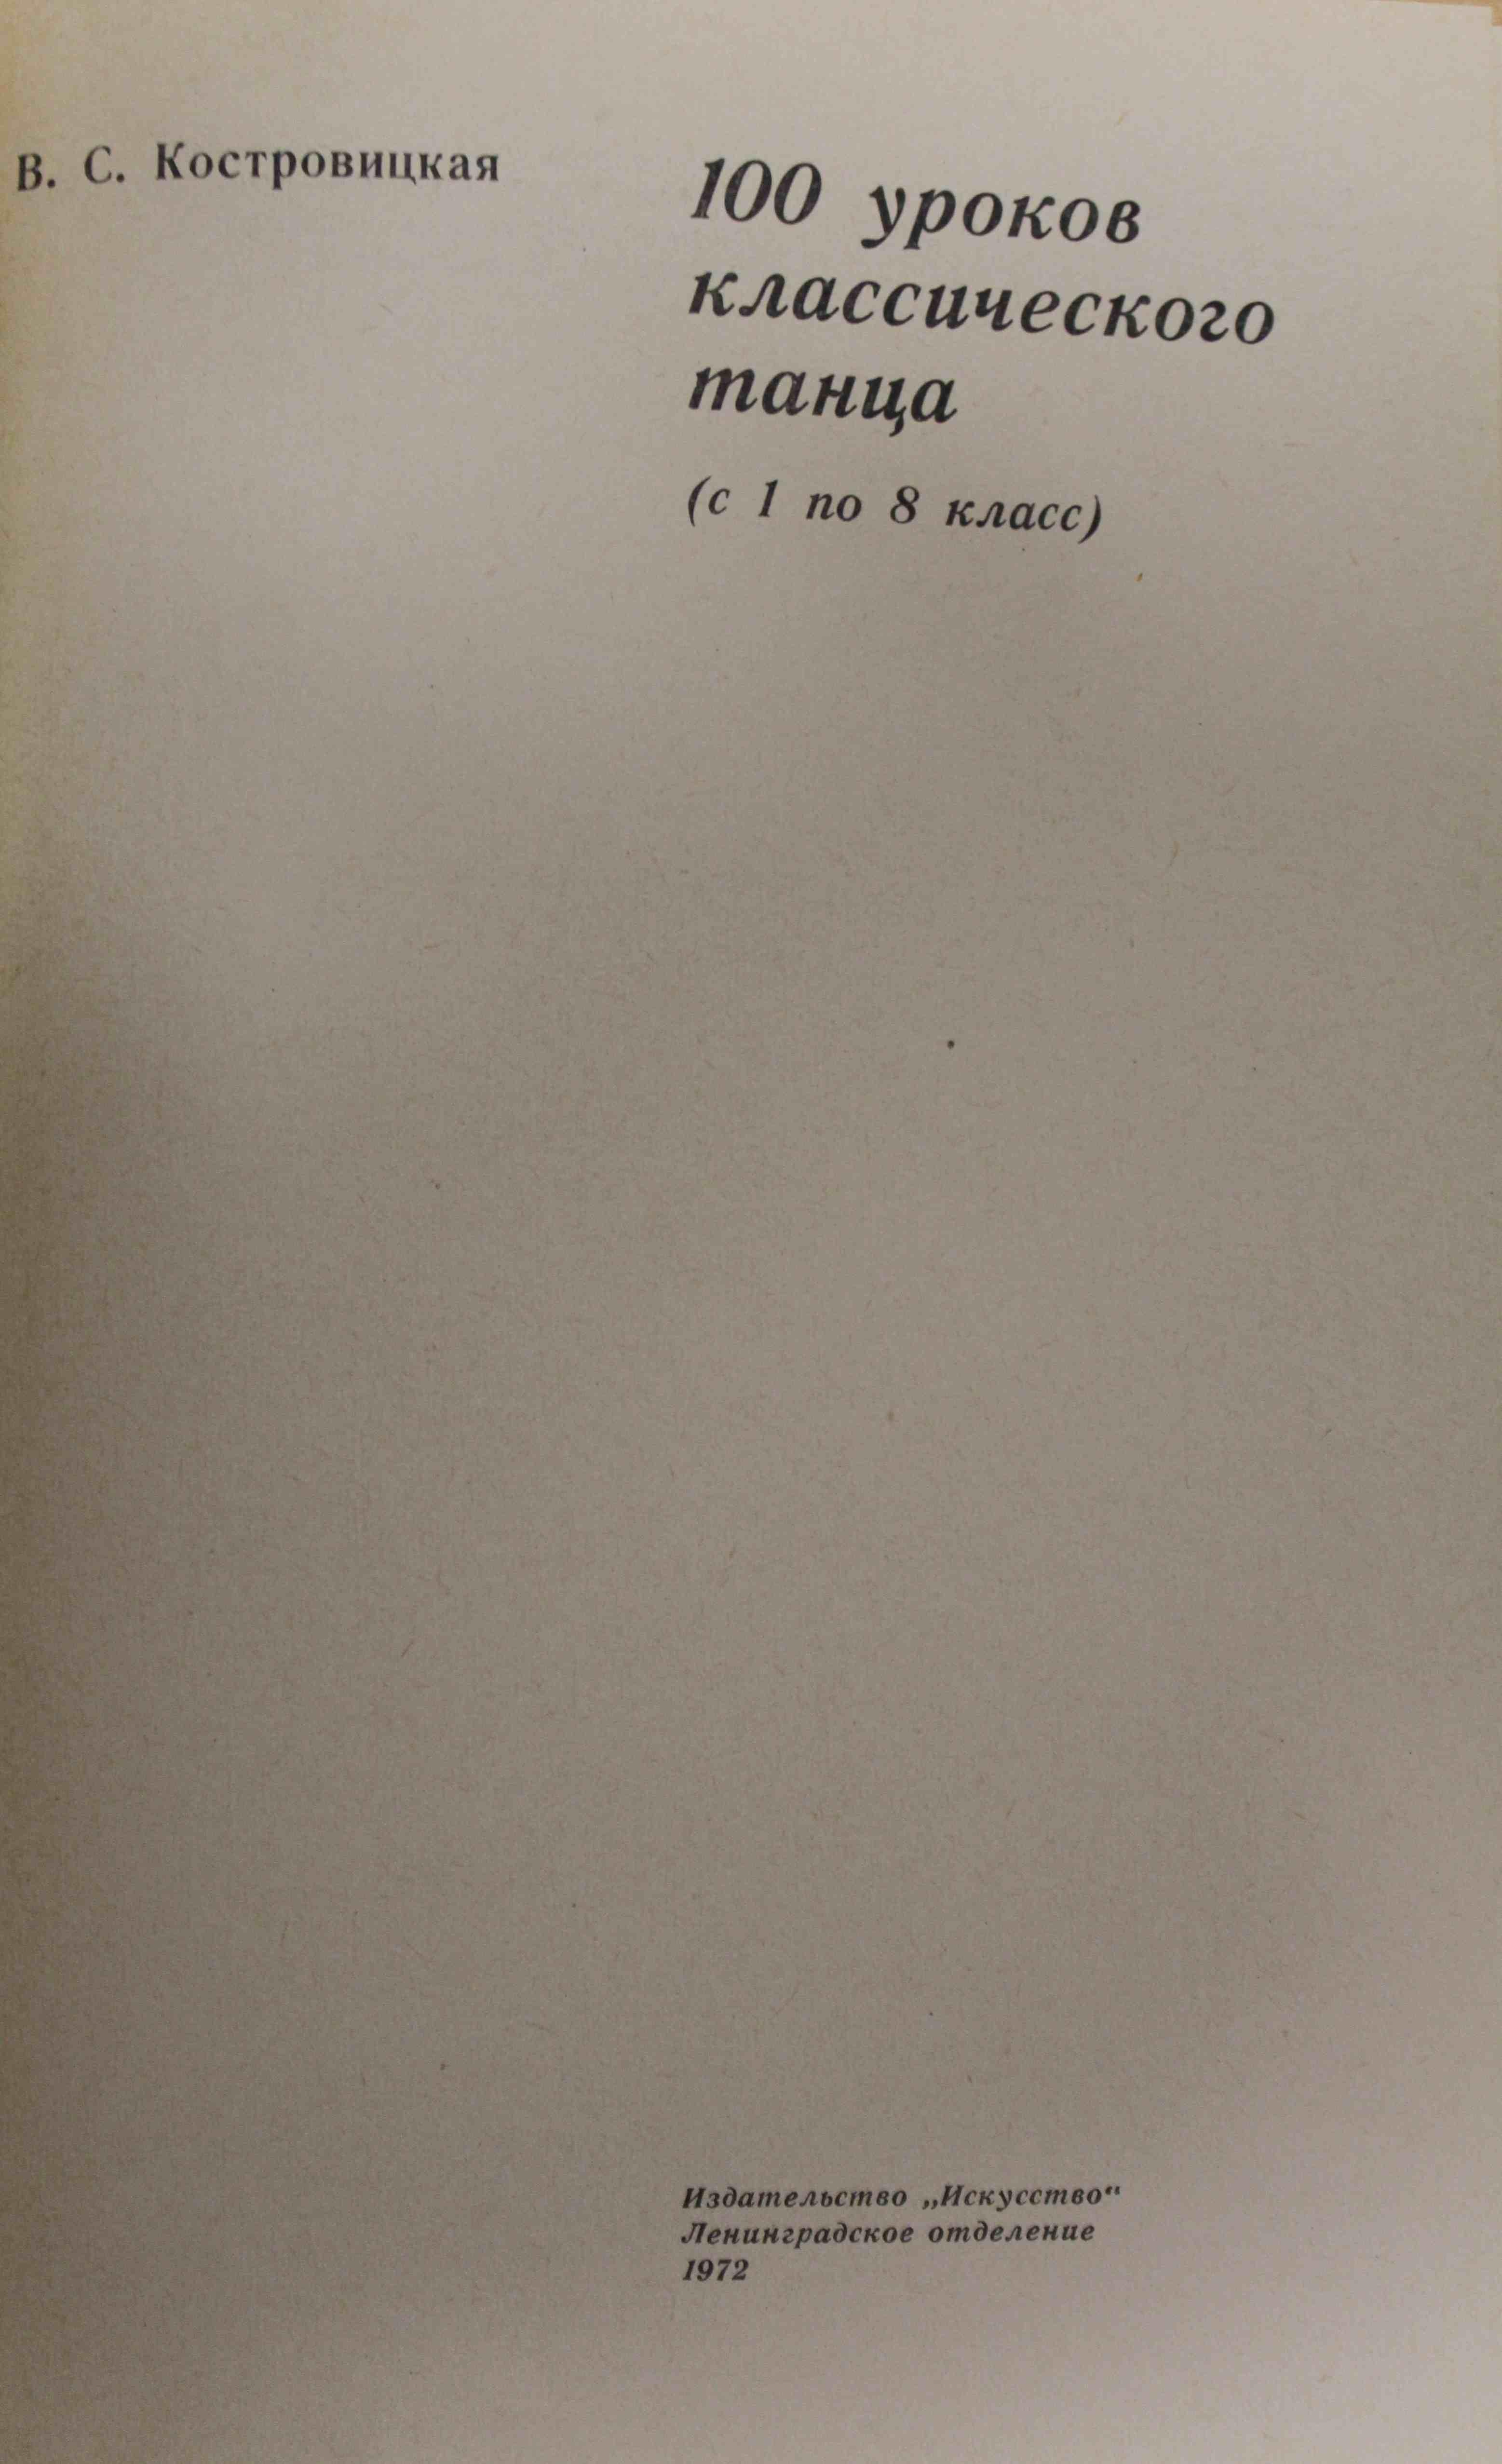 100 Lezioni di Danza Classica (1972) - V. S. Kostrovitskaja - 100 Yроков Kлассического Tанца (1972) - B. C. Костровицкая